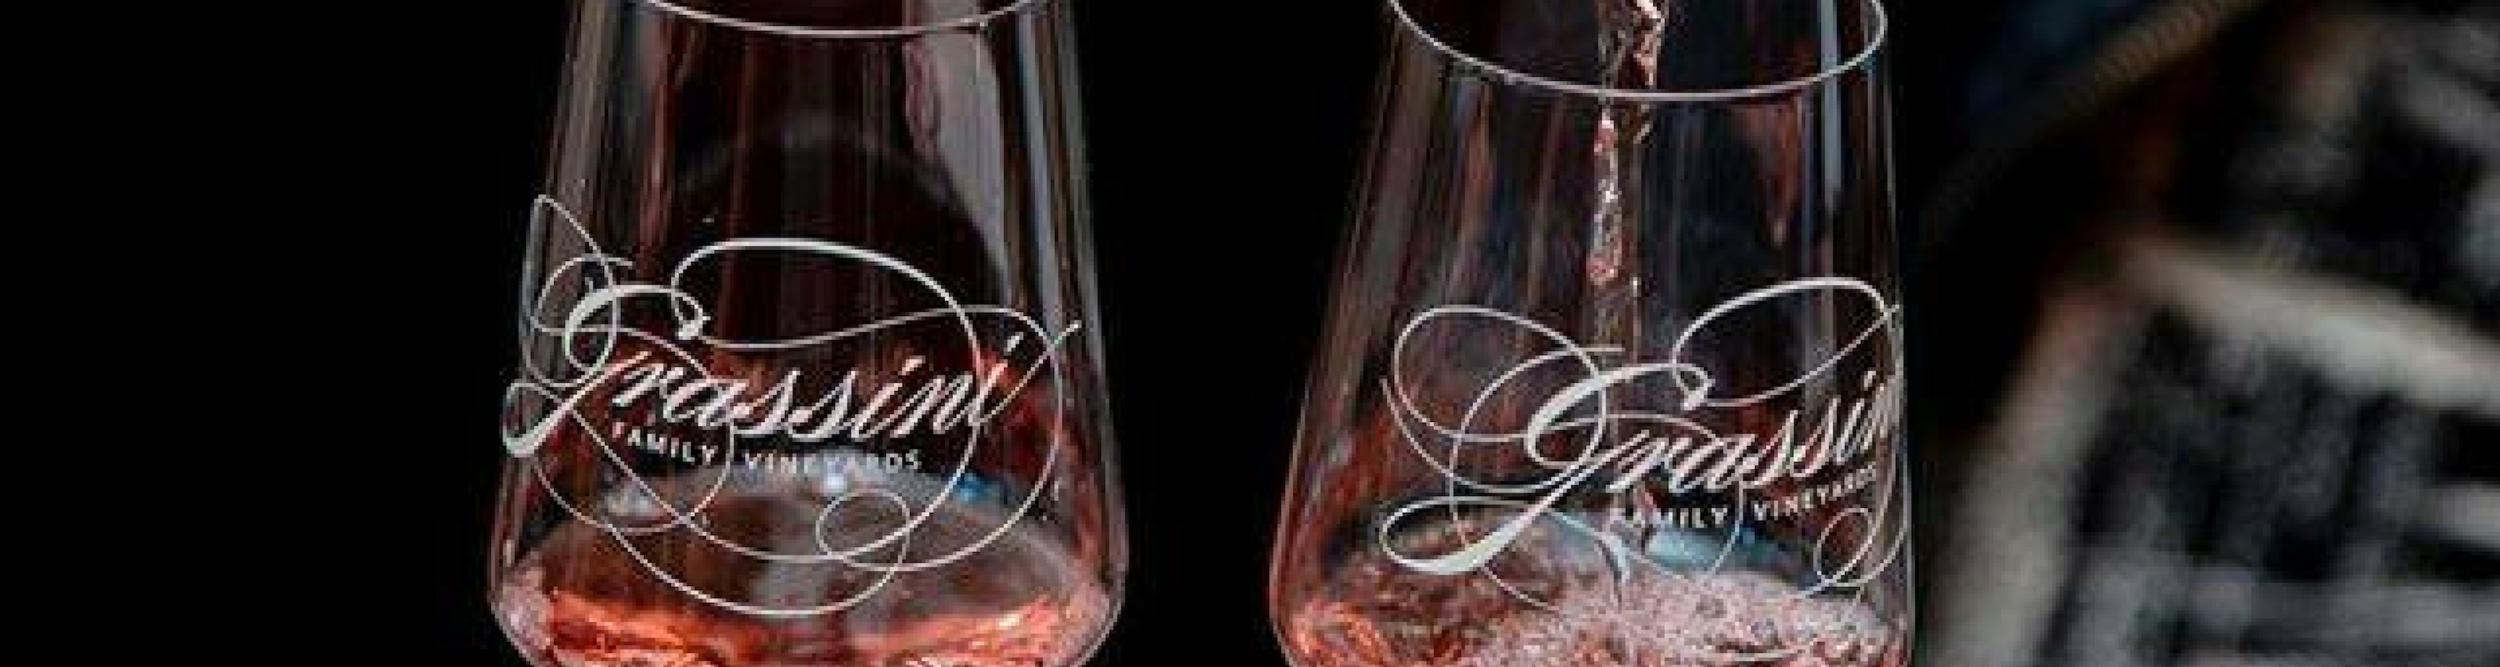 SBRW- Main Image- Grassini Family Vineyards.png